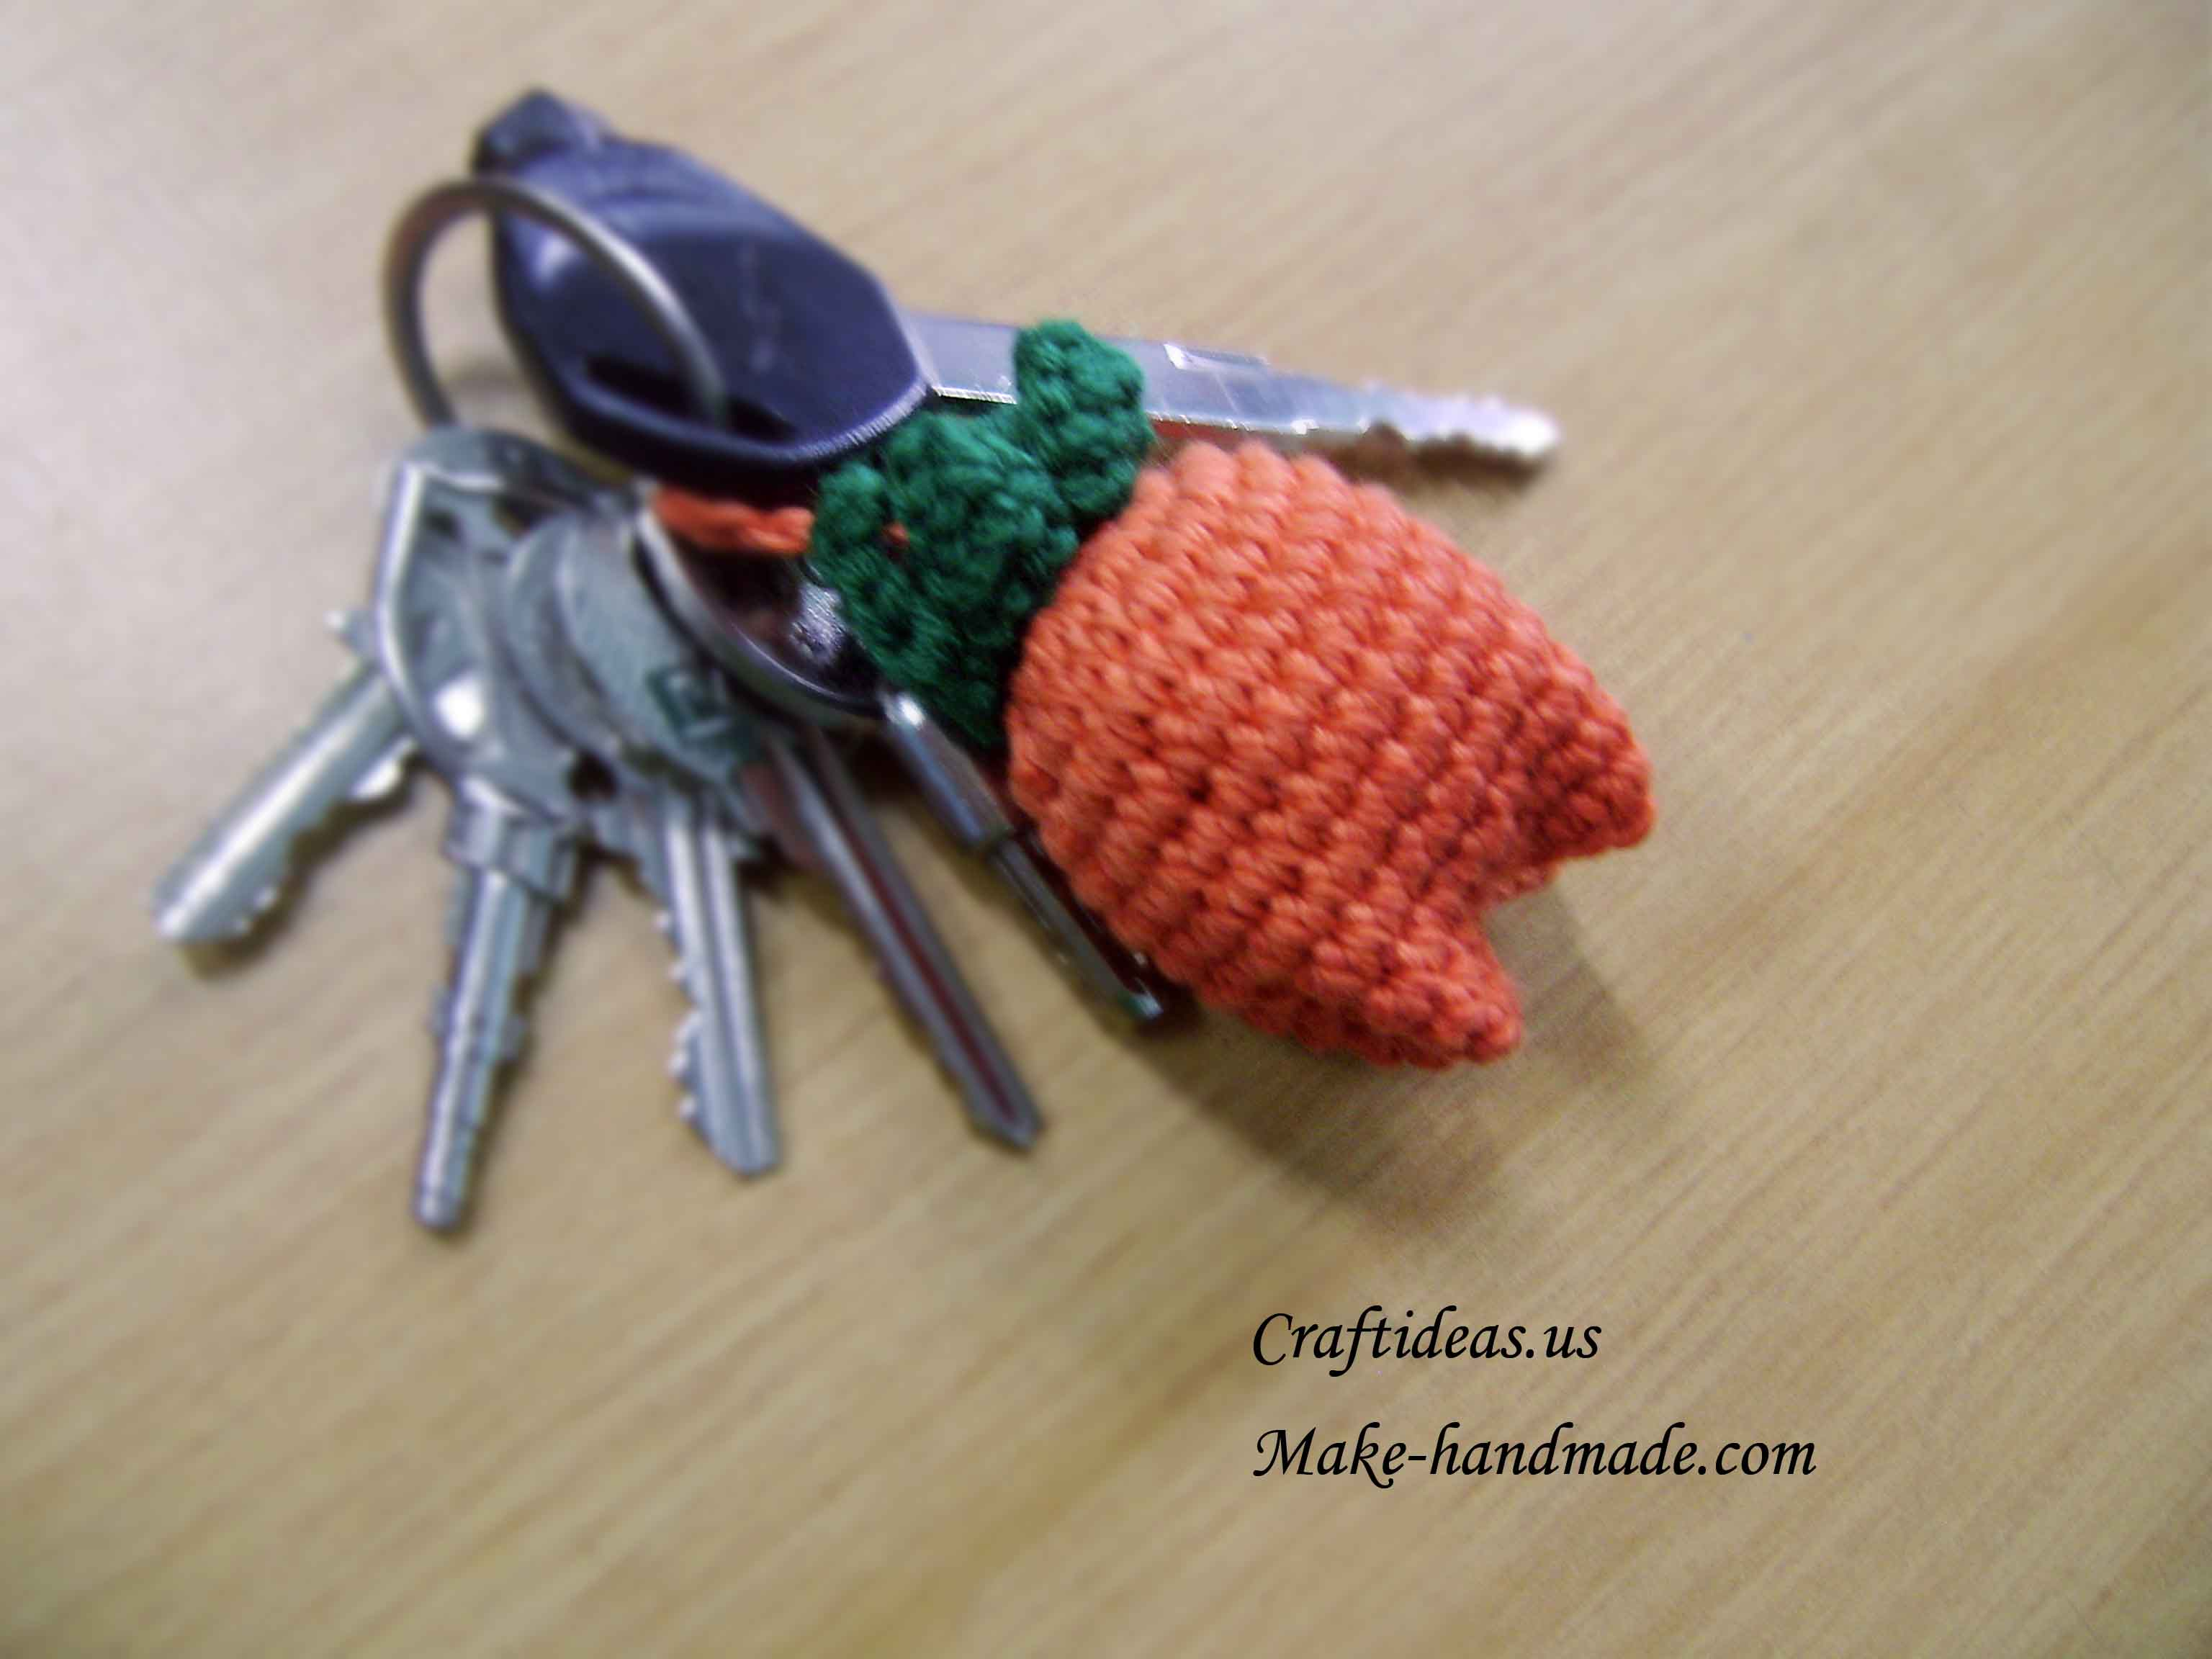 Amigurumi Flower Tutorial : Crochet tulip flower tutorial craft ideas